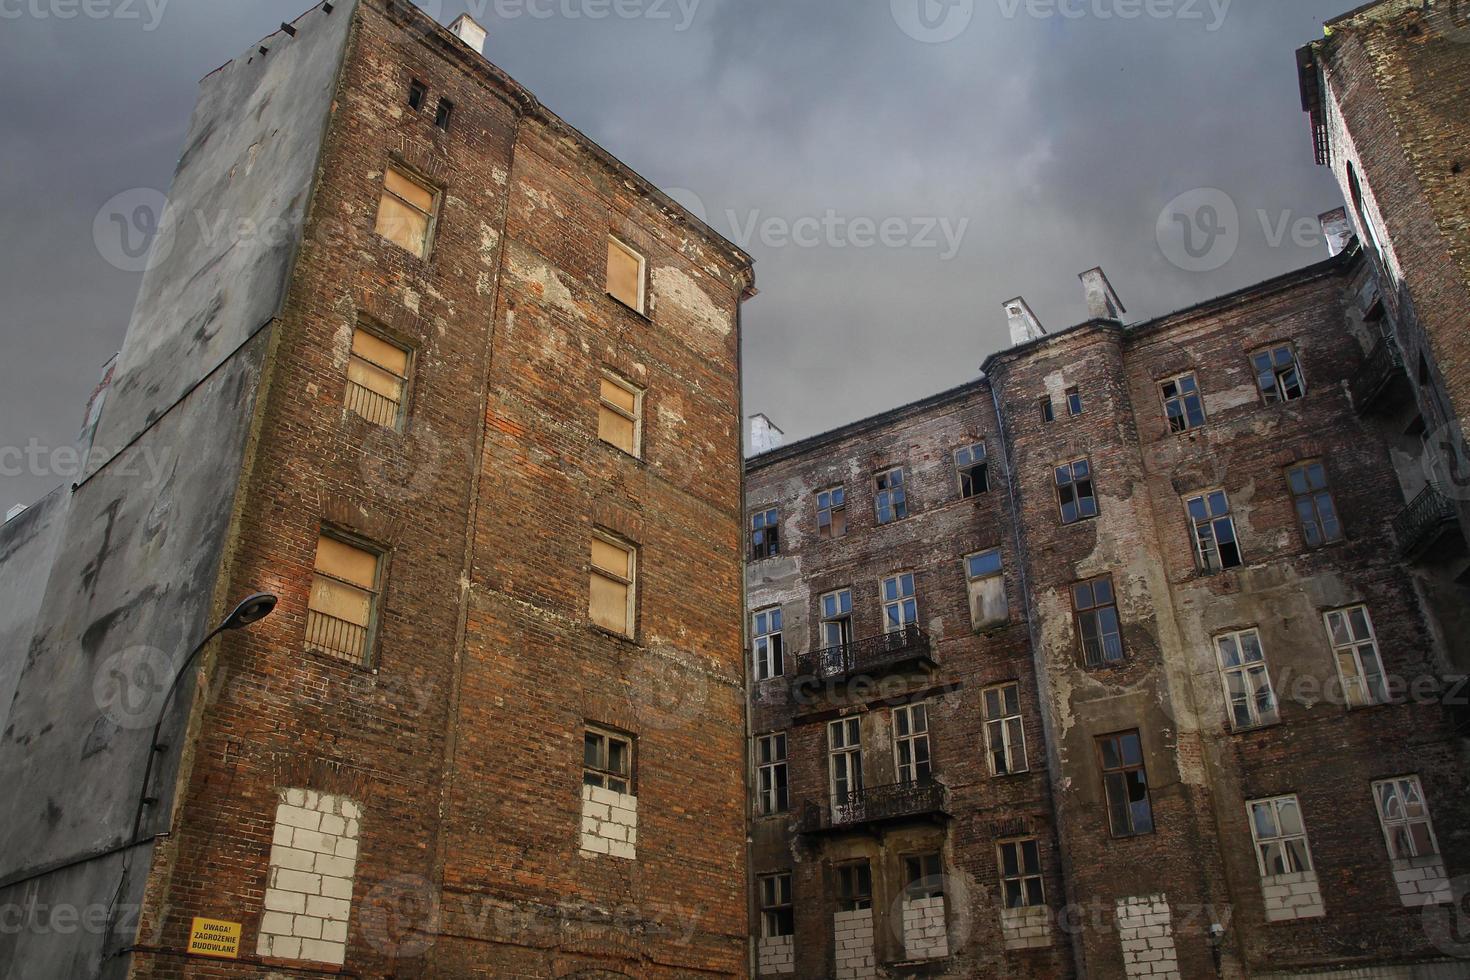 Fachada del gueto de Varsovia, Varsovia, Polonia foto